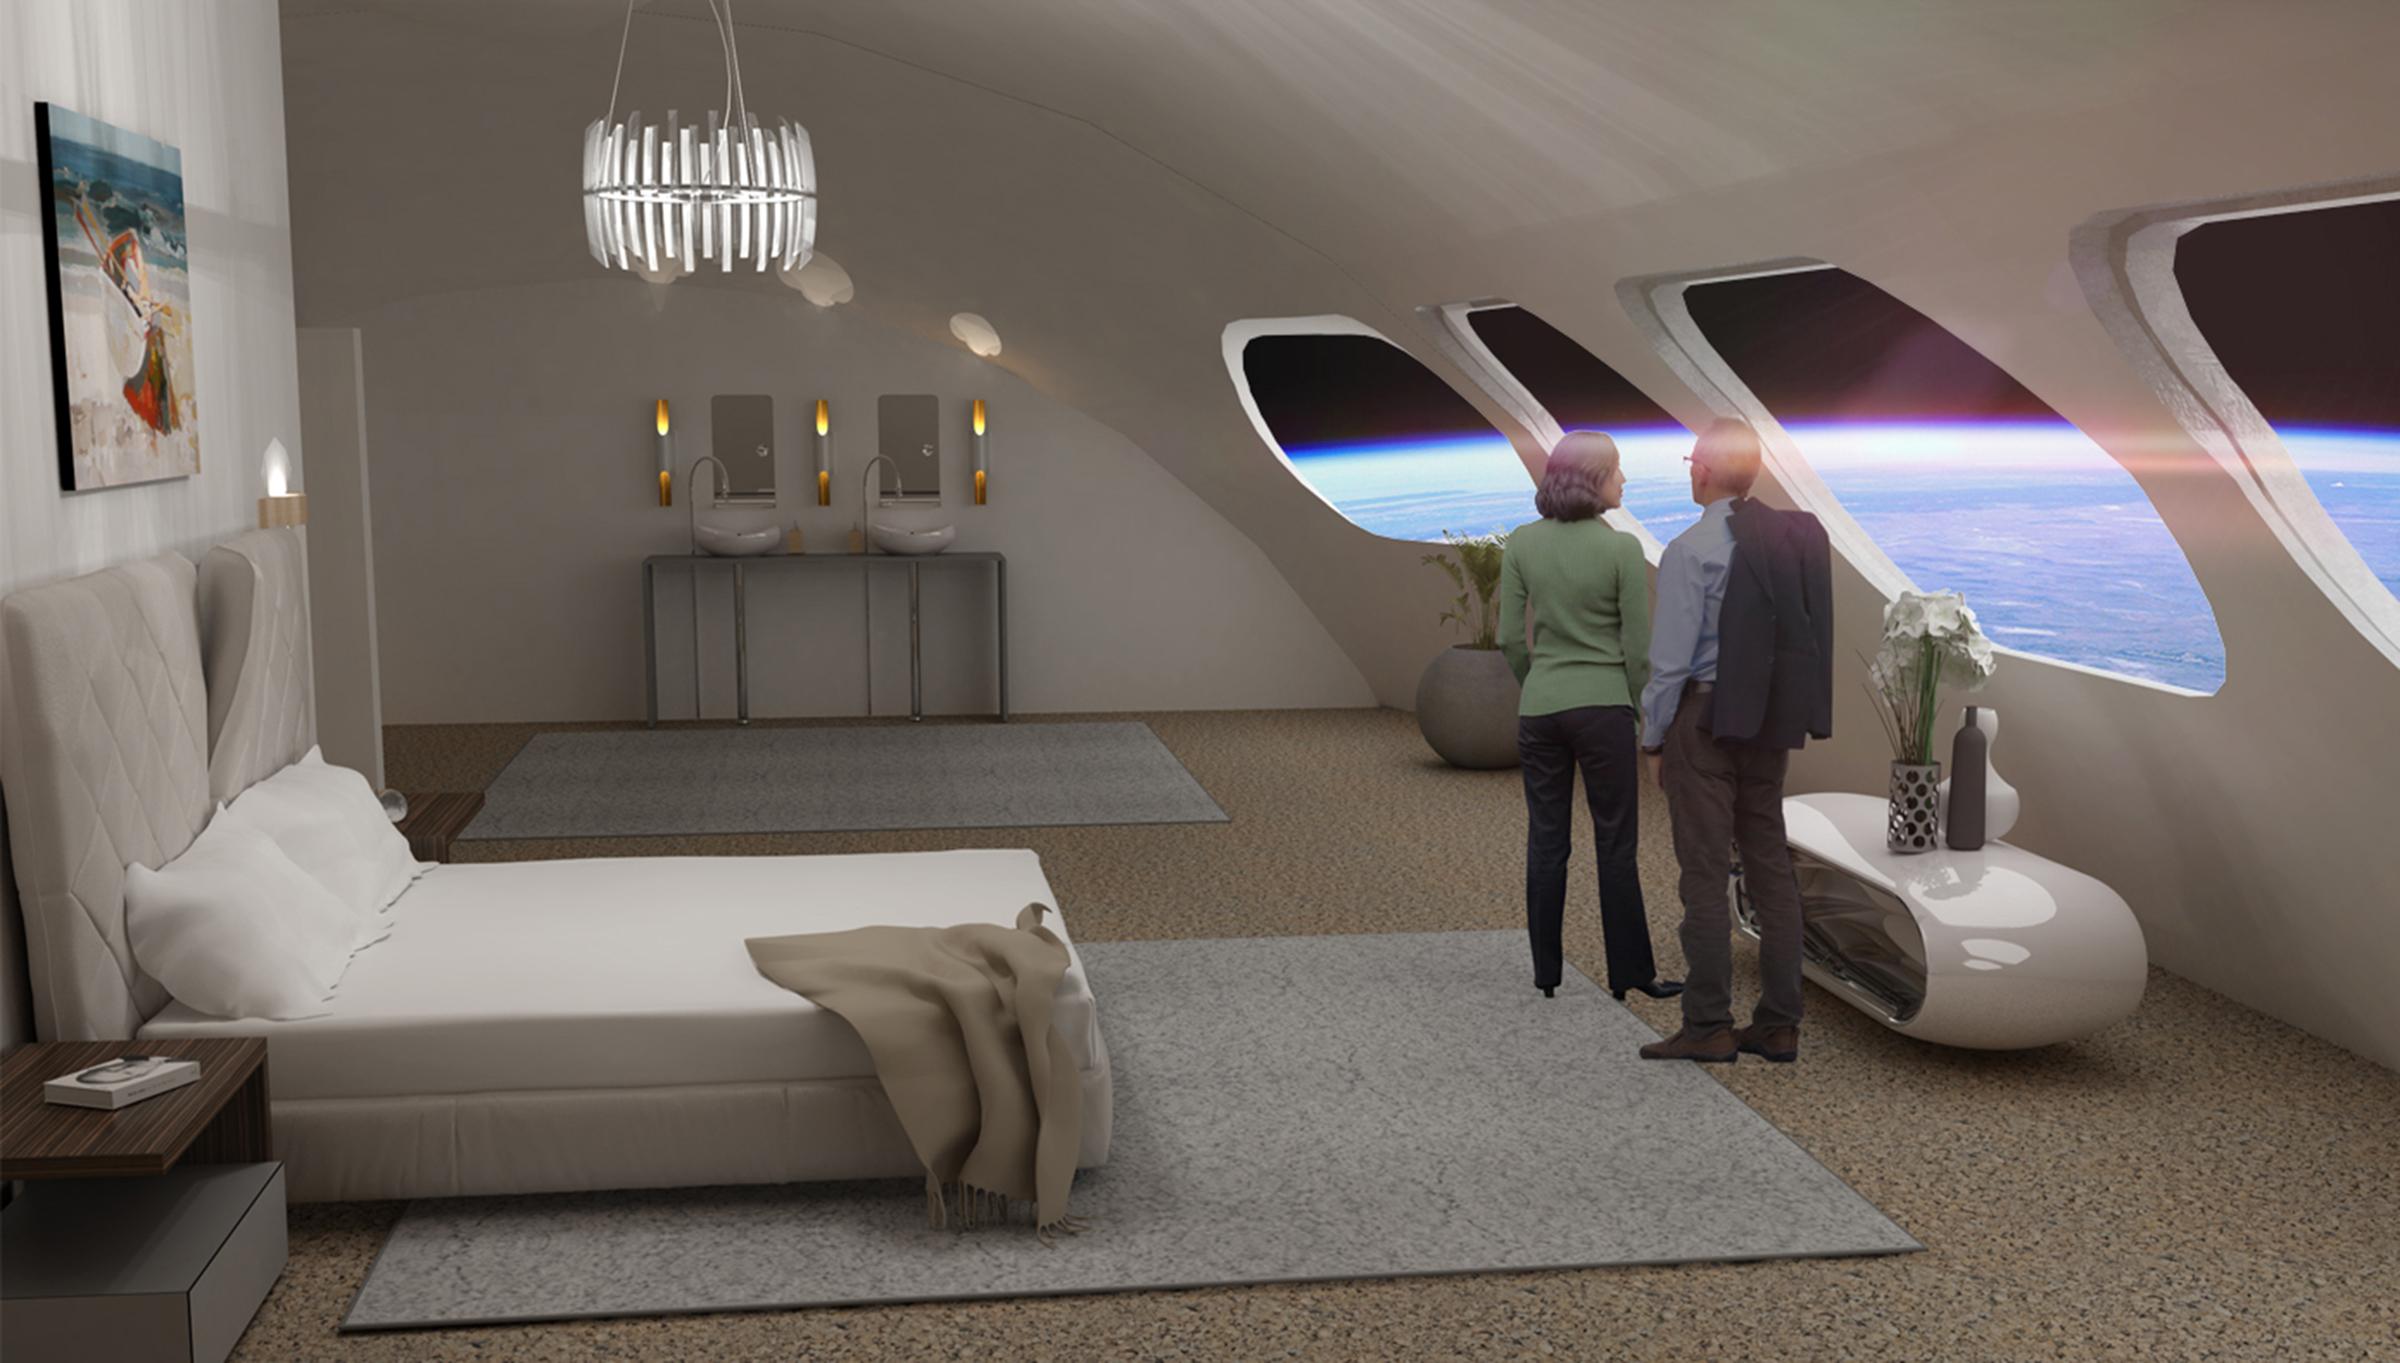 primer hotel espacial